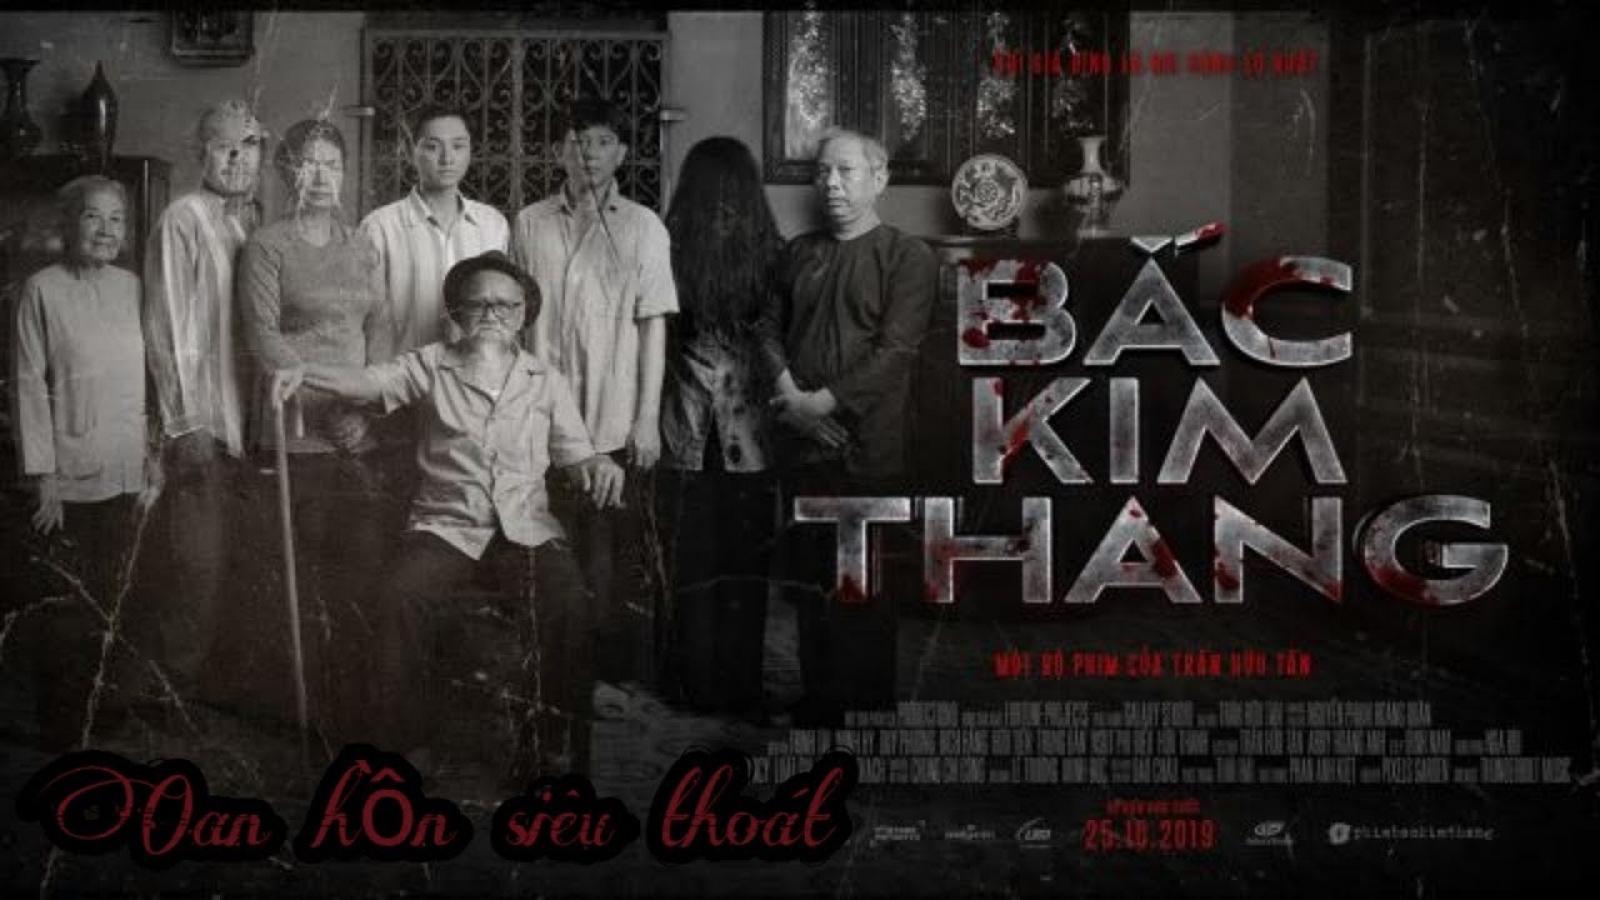 Asian Film Festival to screen Vietnamese horror movie